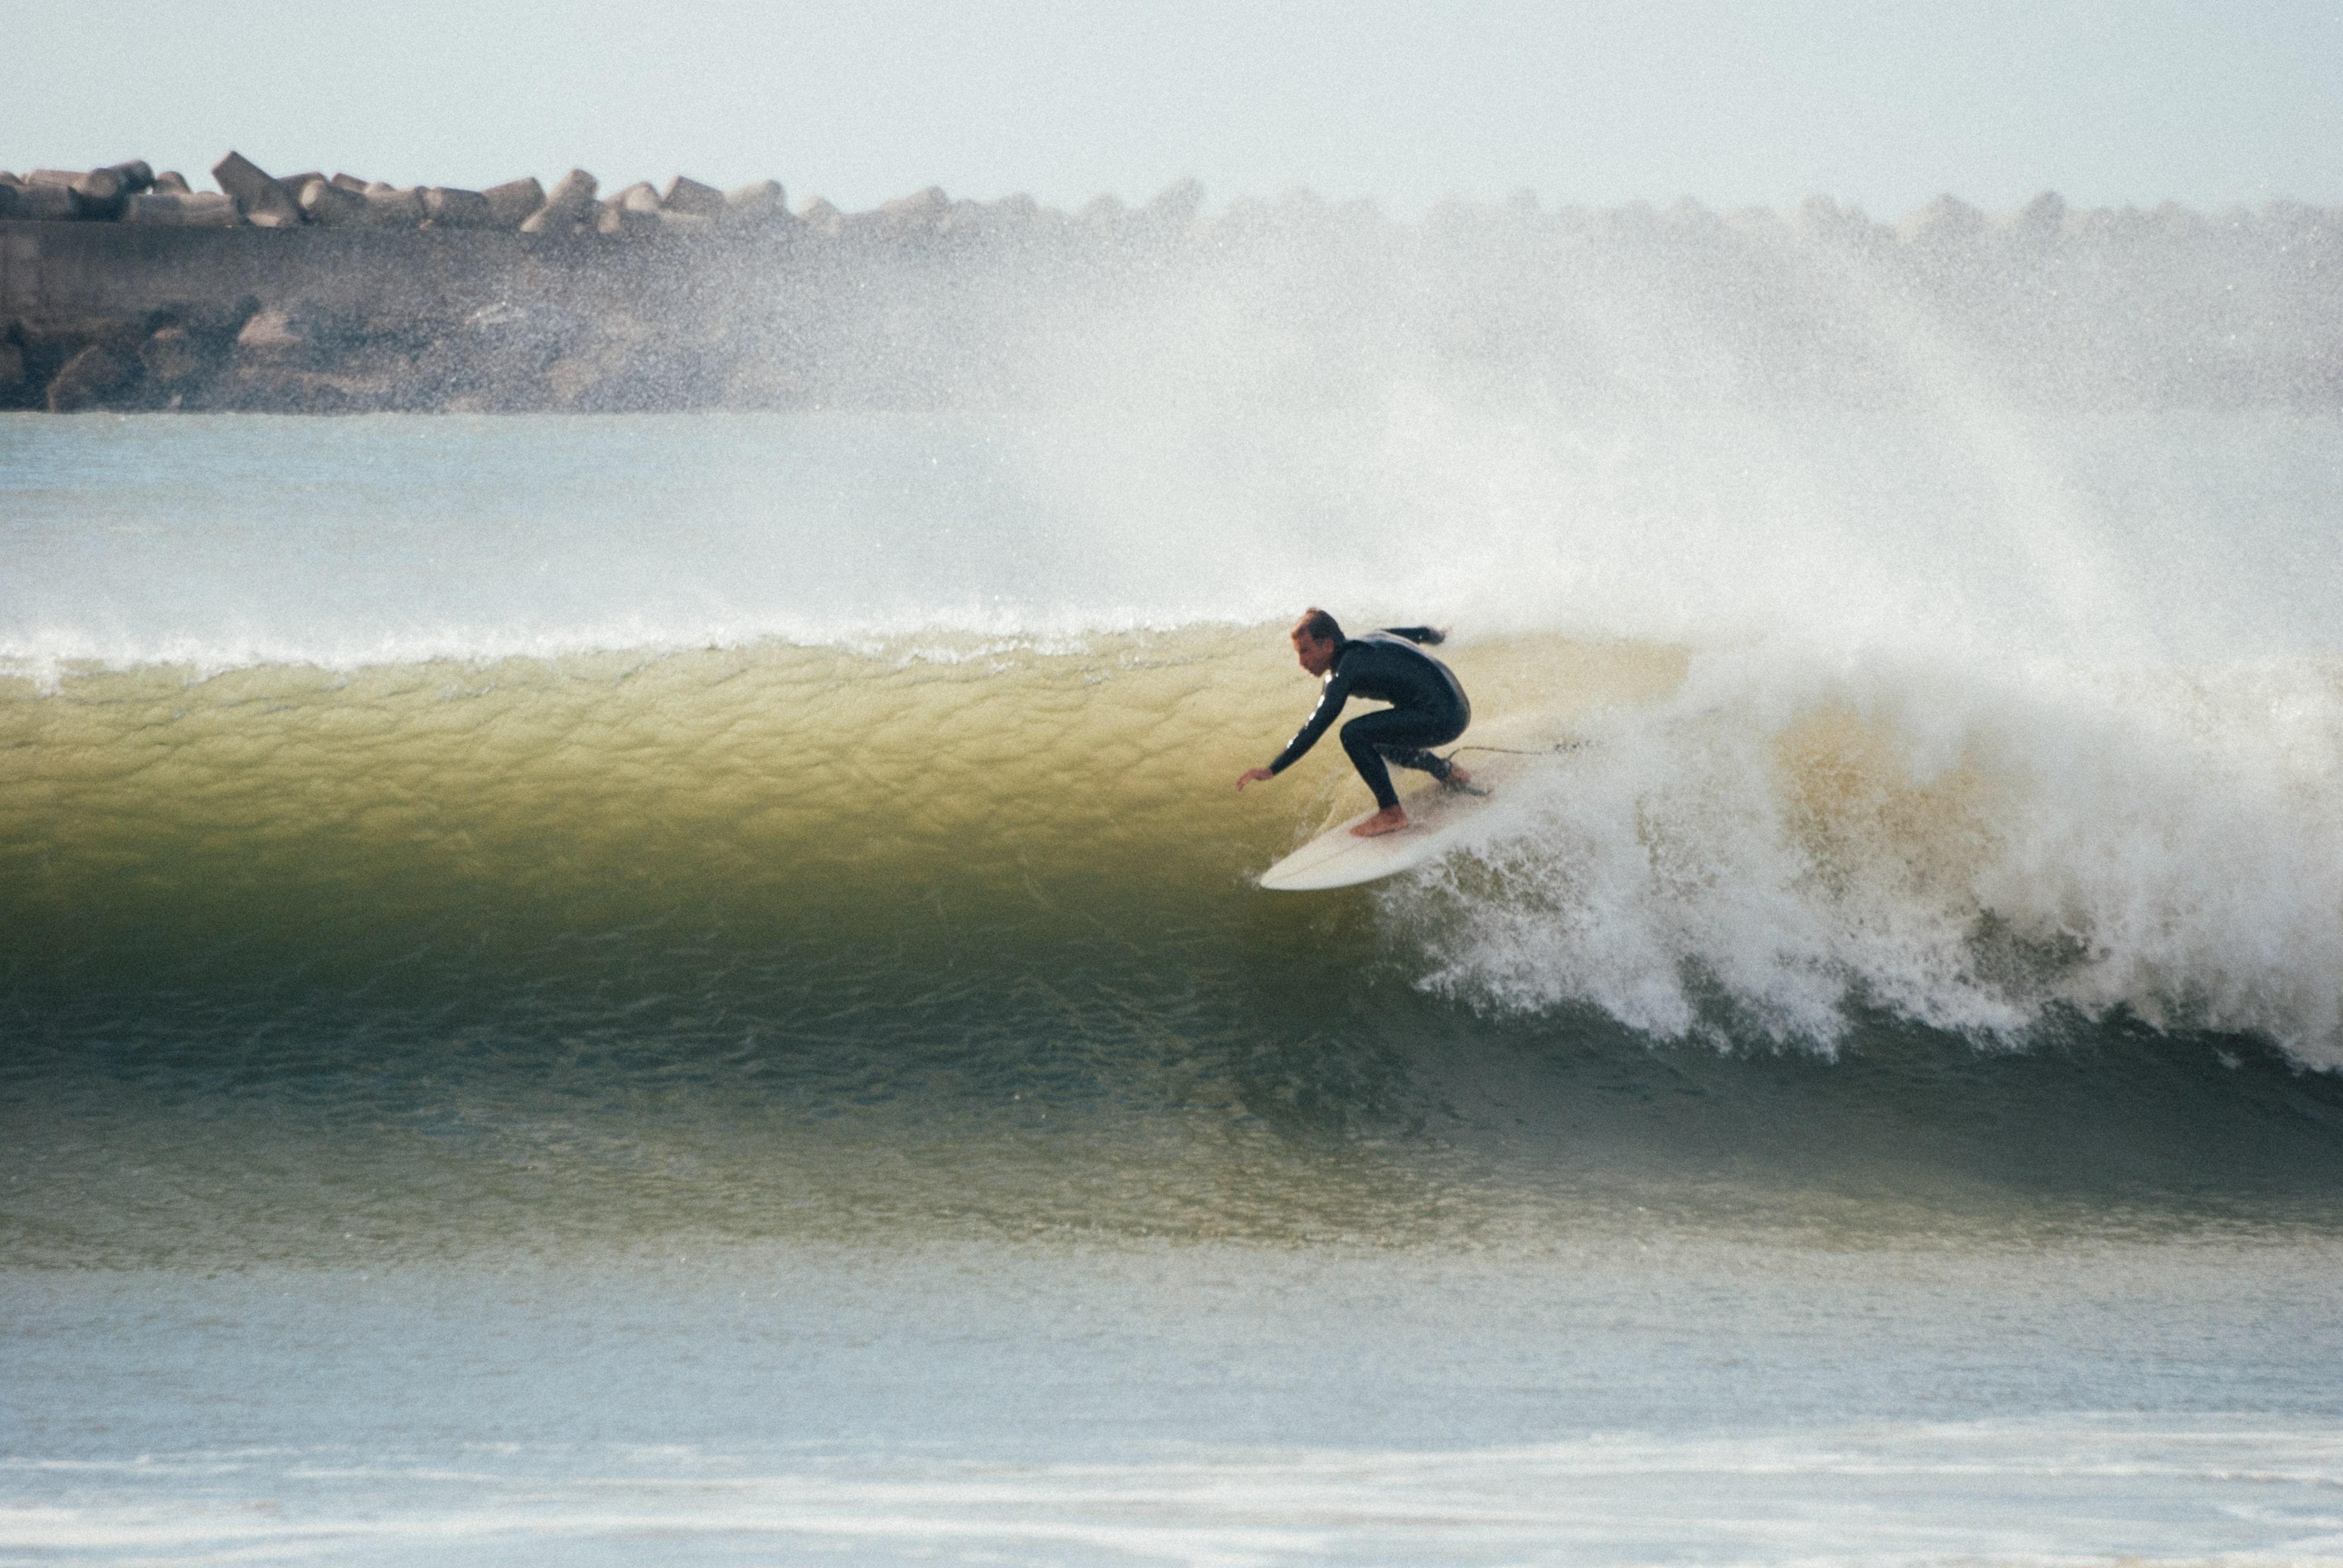 Gian surfing